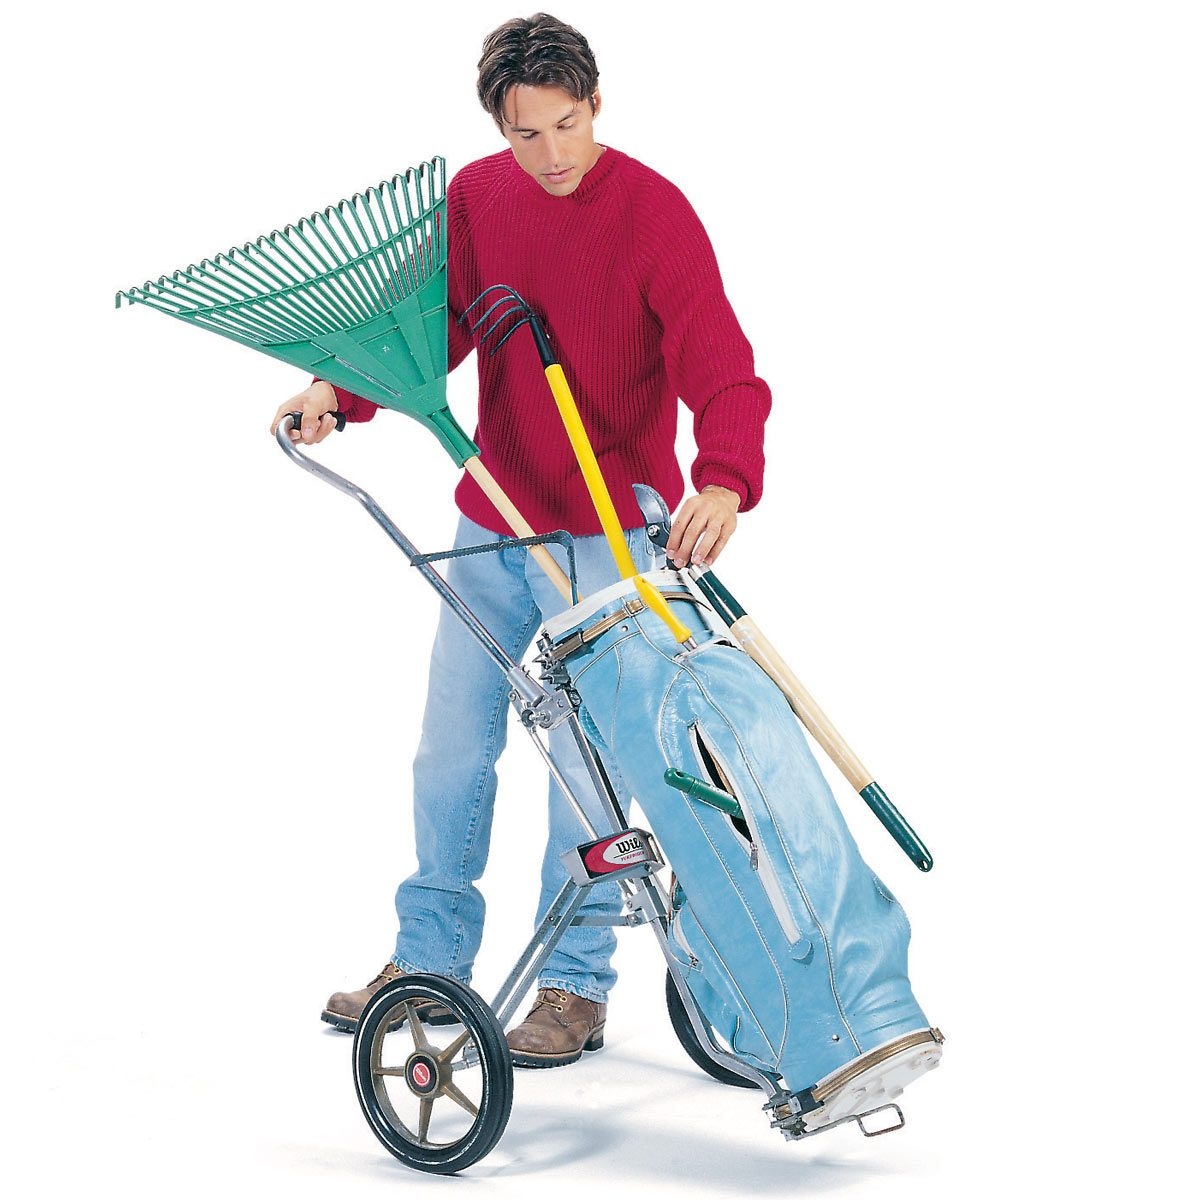 FH98APR_01300001 golf bag lawn tool carrier